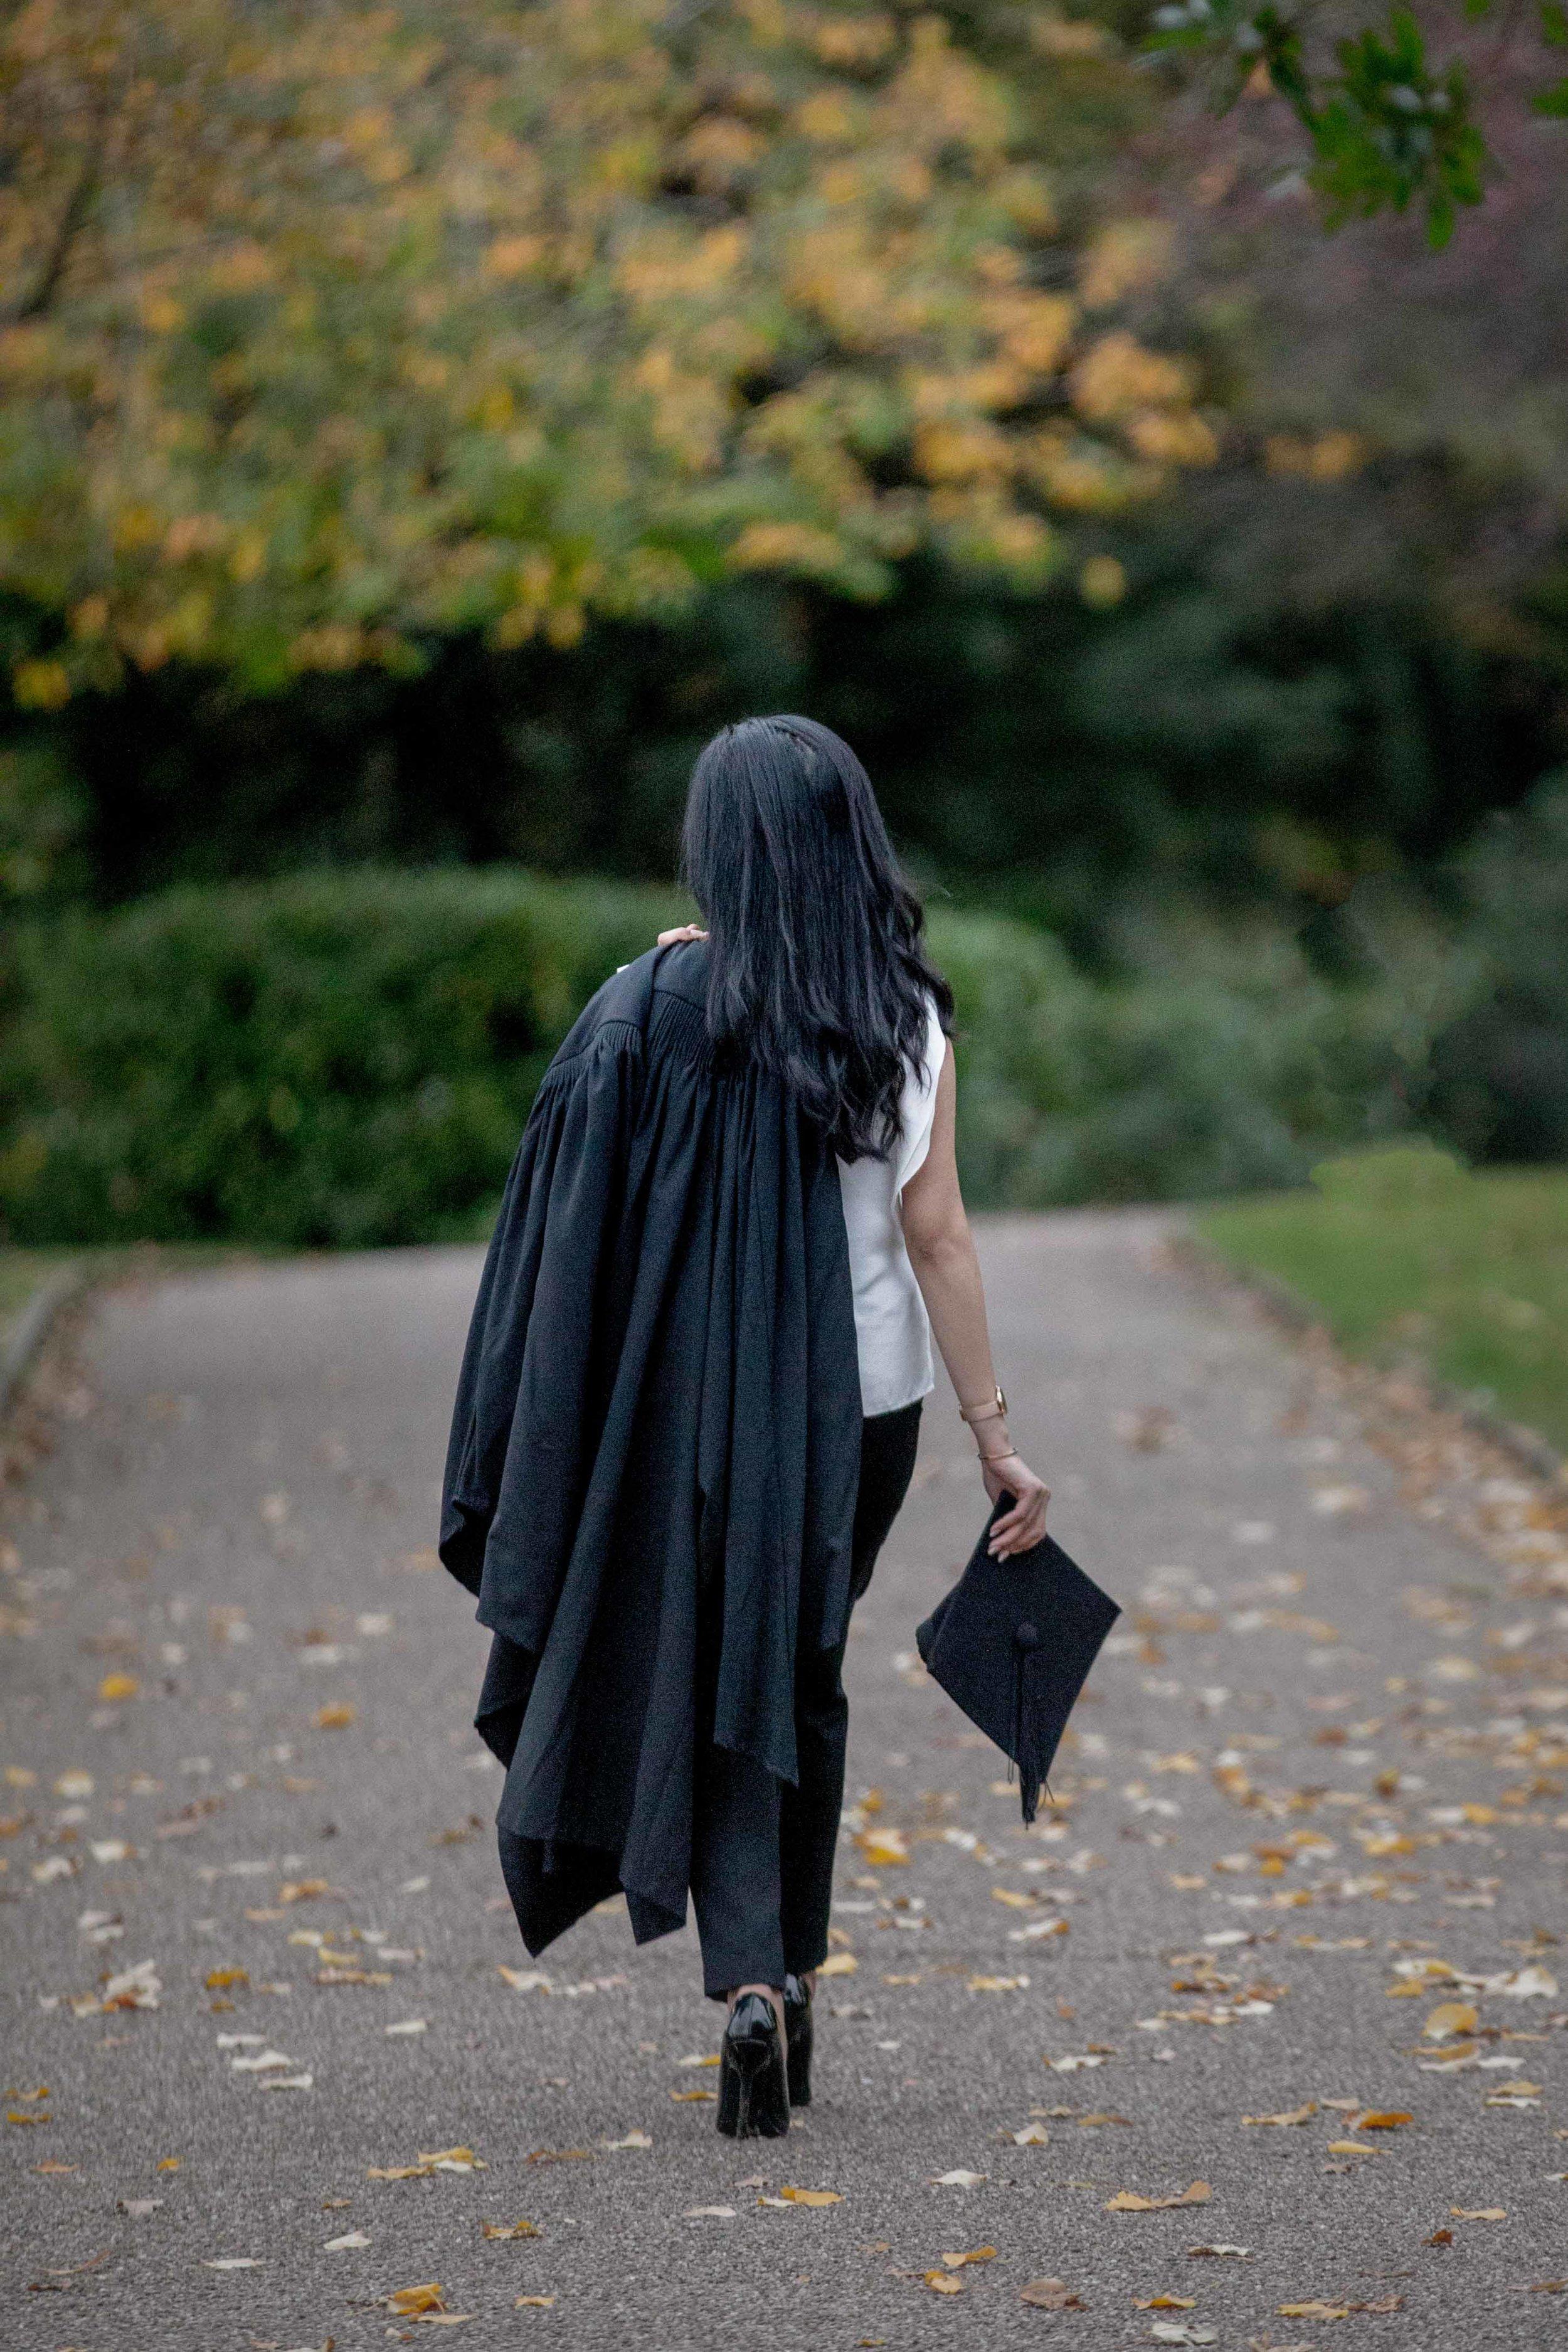 chester-university-graduation-ceremony-photography-photoshoot-graduation-photographer-Bristol-London-Cardiff-Birmingham-Chester-Natalia-smith-photography-19.jpg